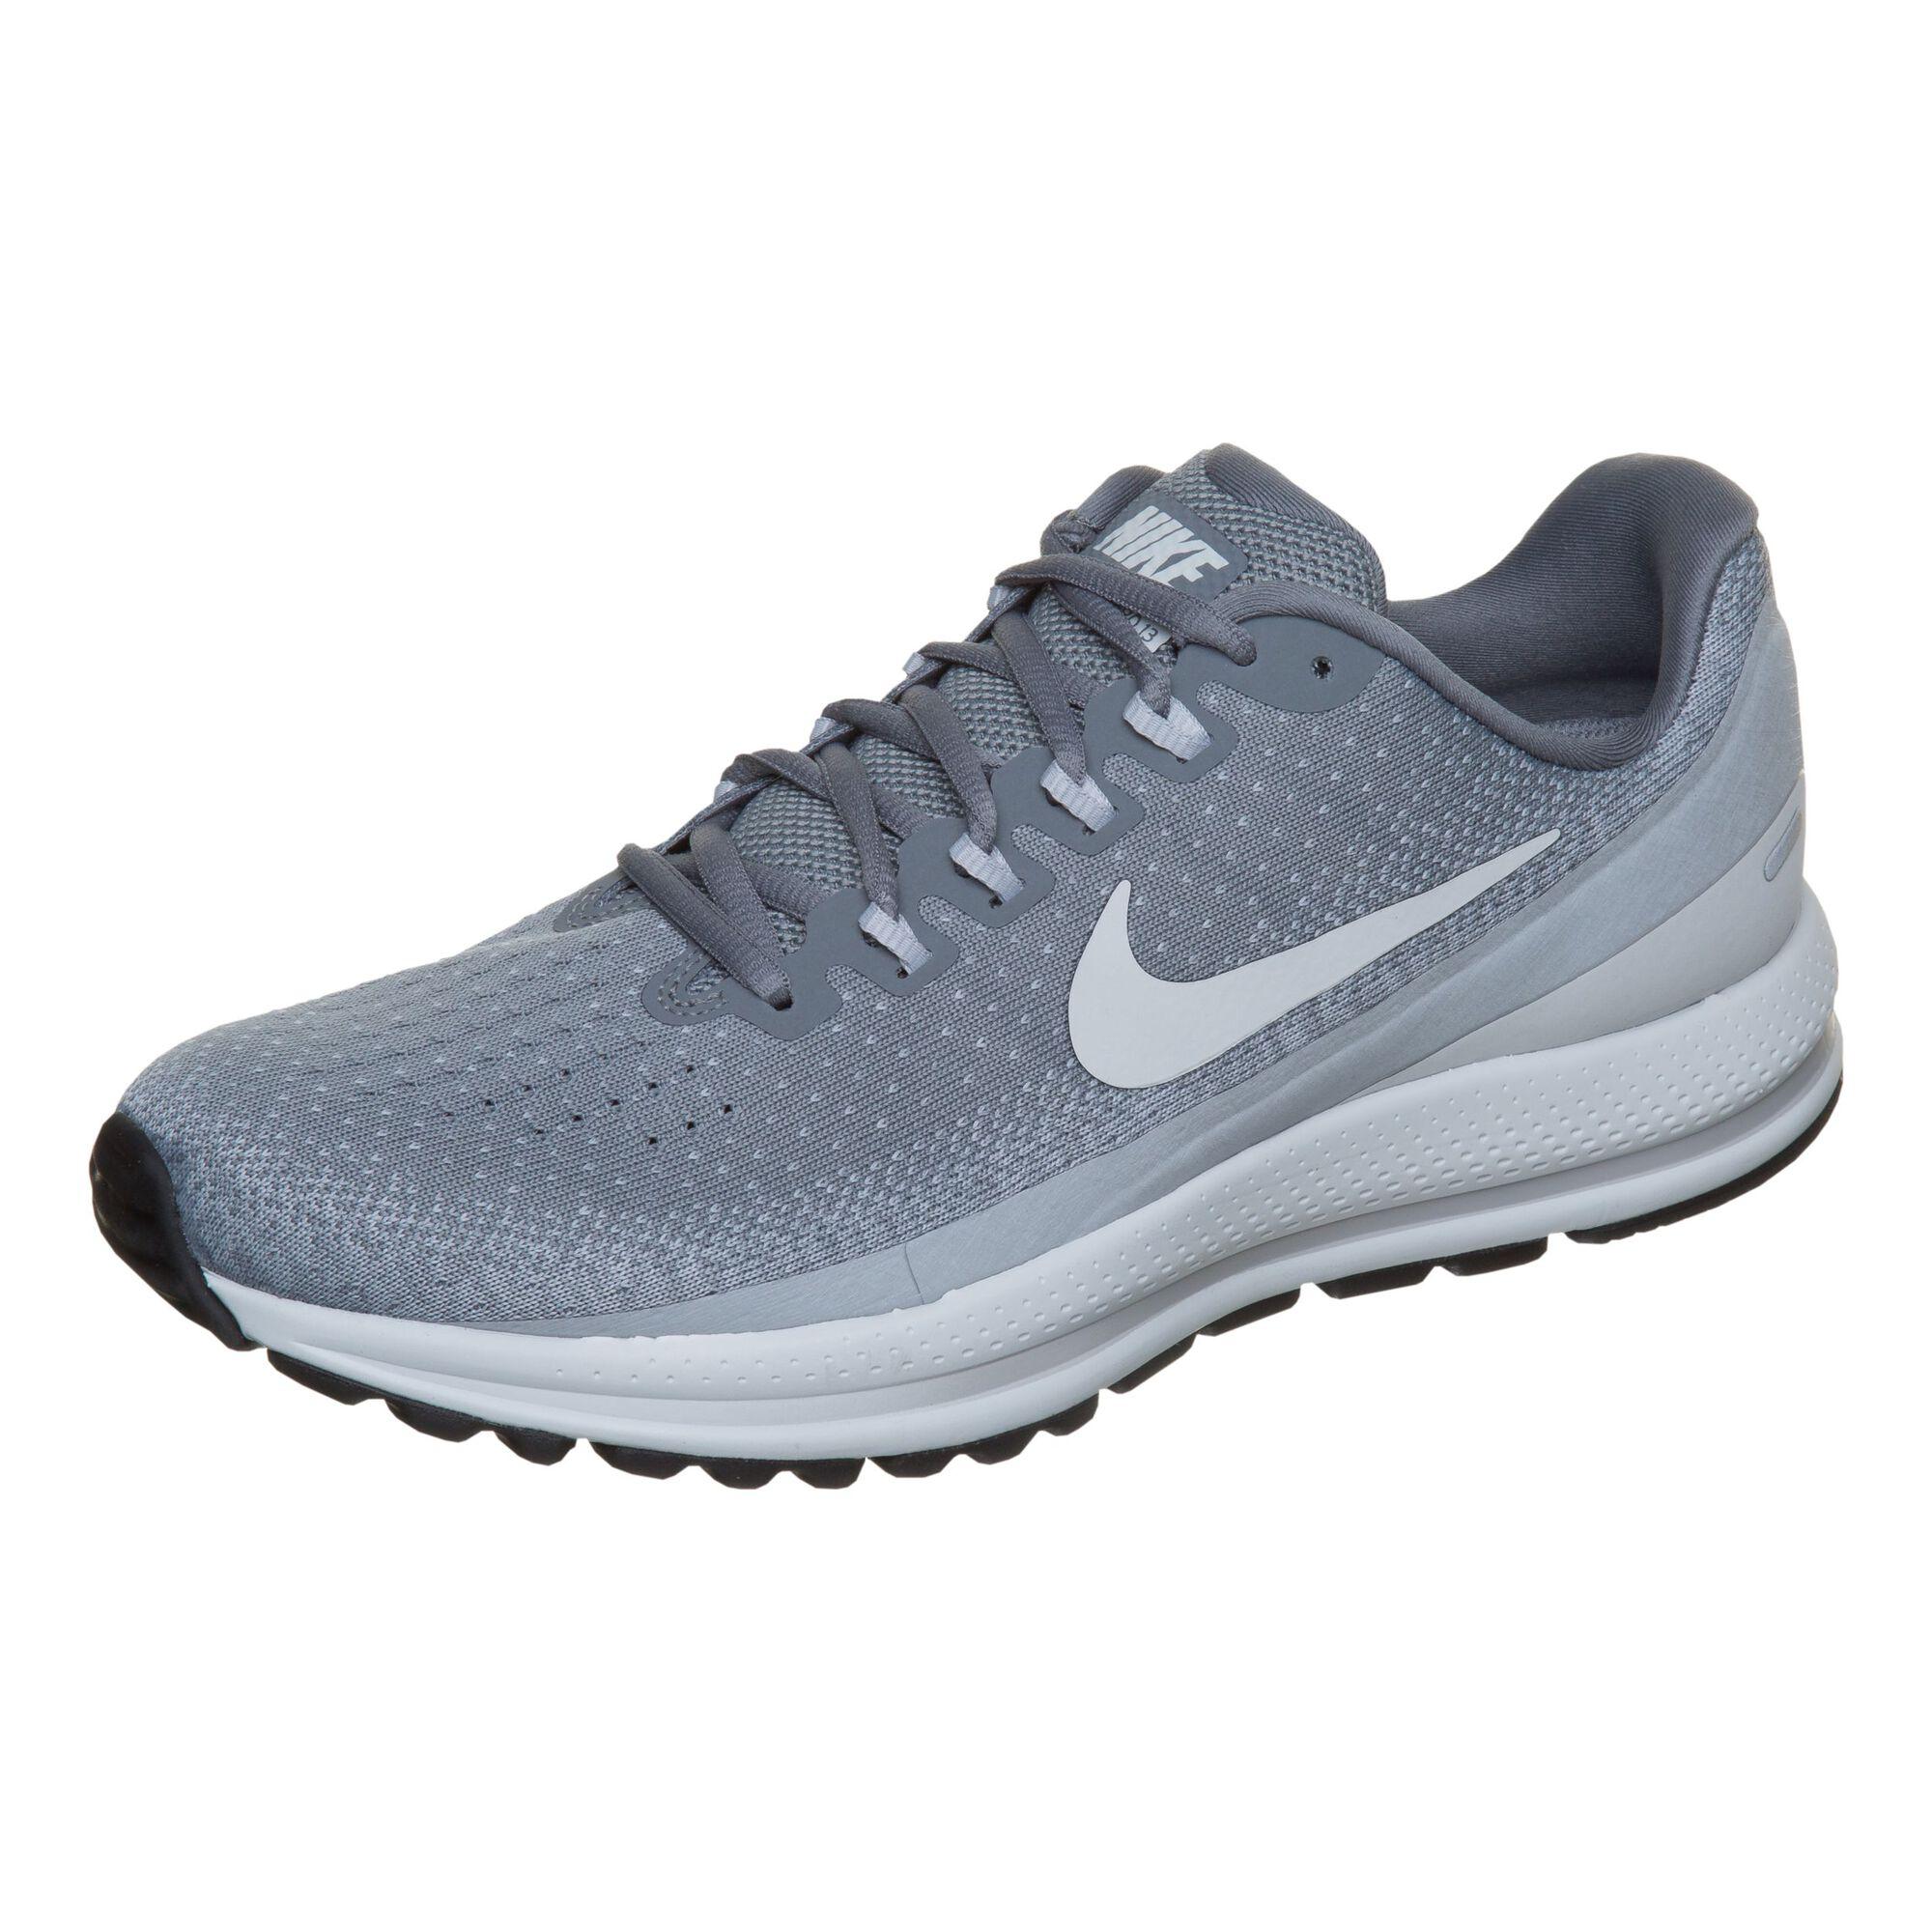 6f08af77bd06 Nike · Nike · Nike · Nike · Nike · Nike · Nike · Nike · Nike · Nike. Air  Zoom Vomero 13 ...